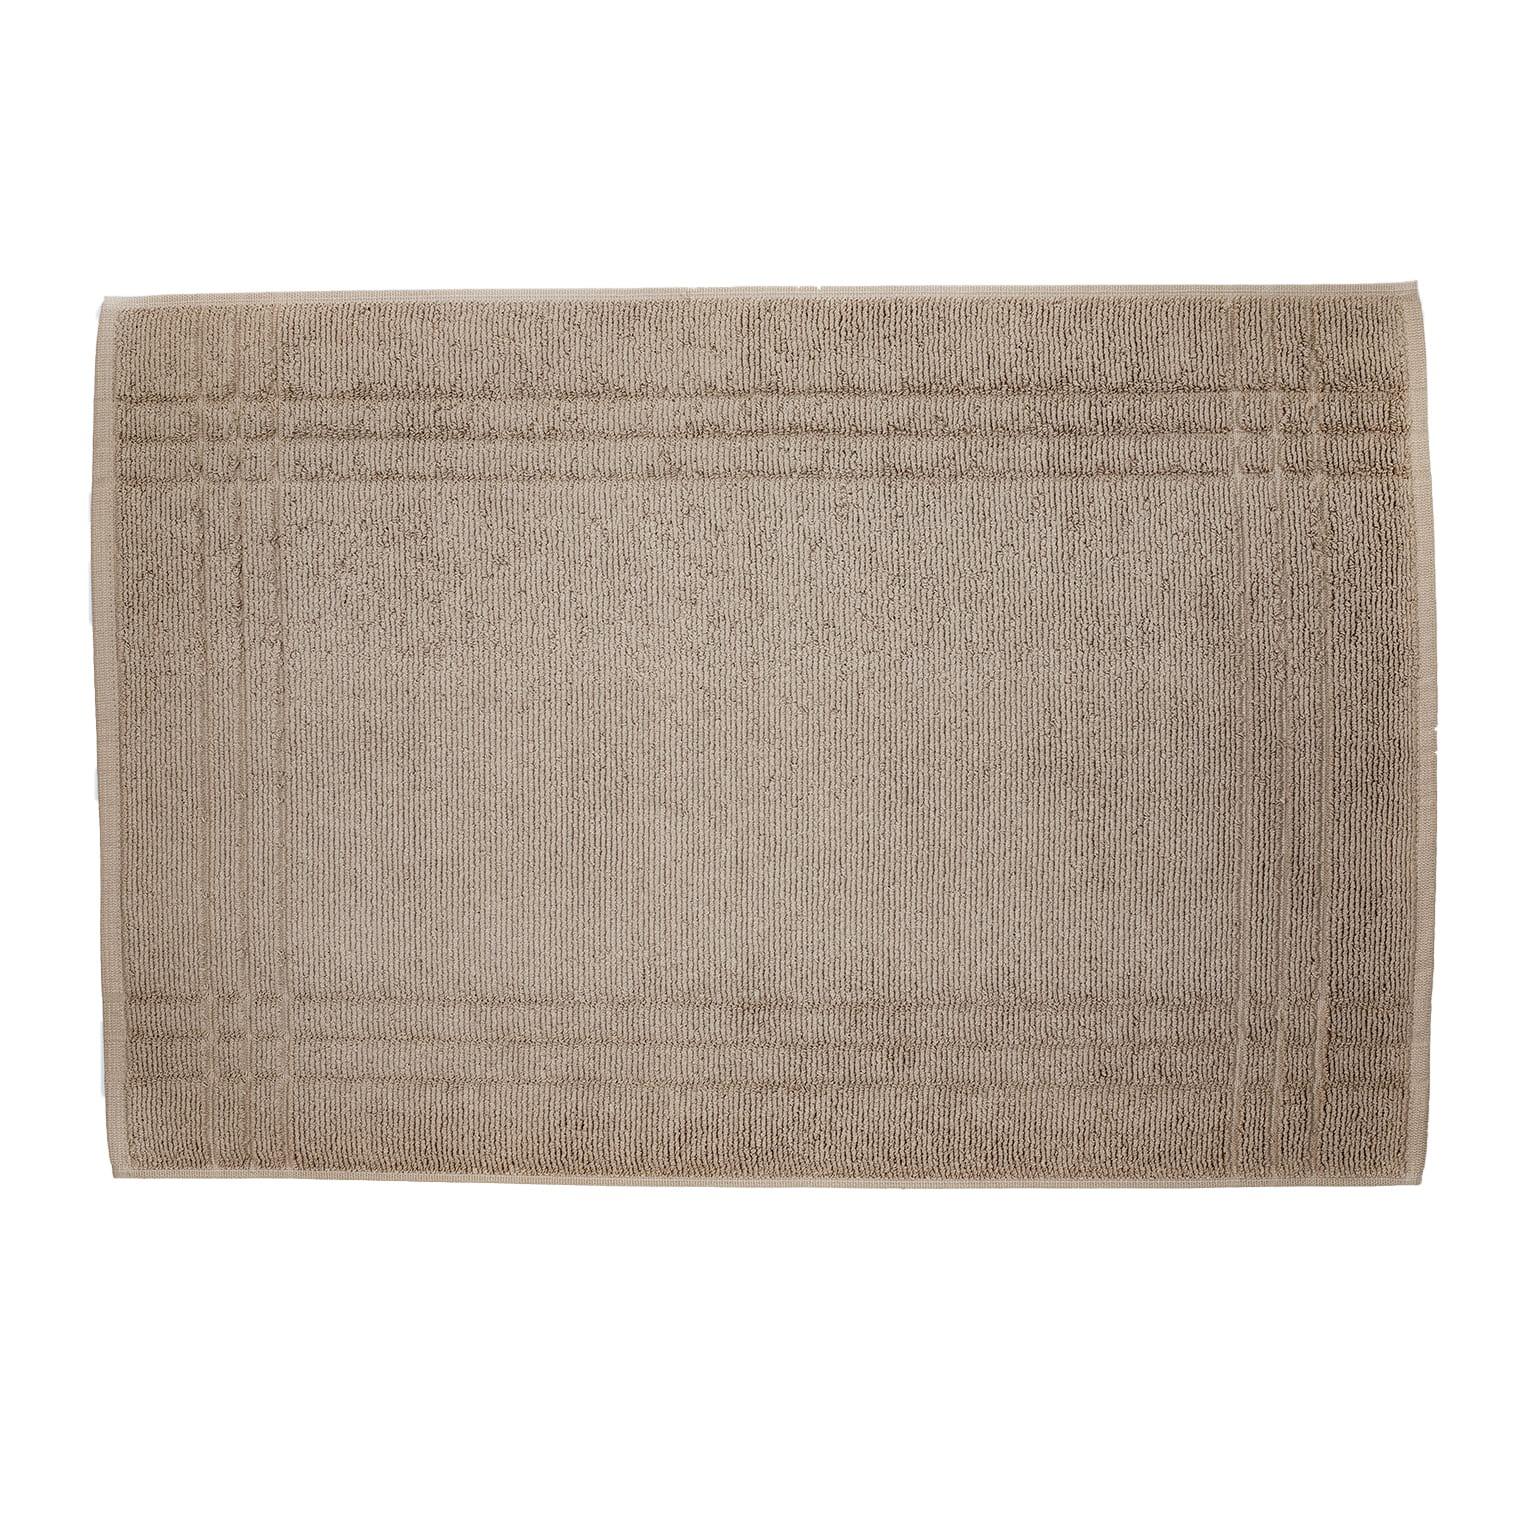 Toalha de Piso Eternity 50x80 cm 100 Algodao Natural - Artex